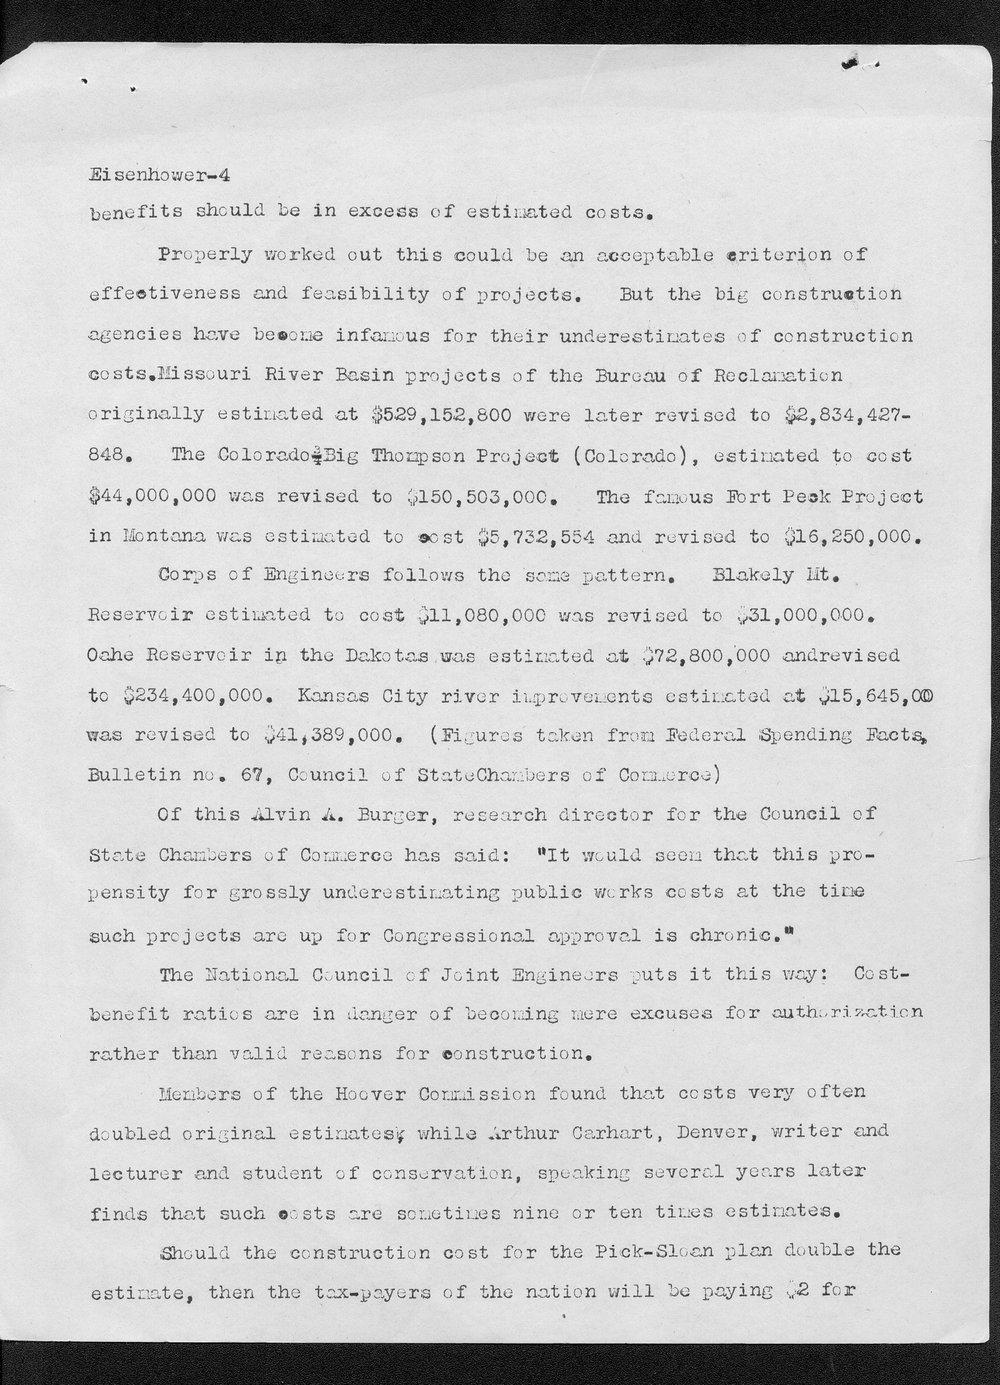 Edith Monfort to Dwight Eisenhower - 4